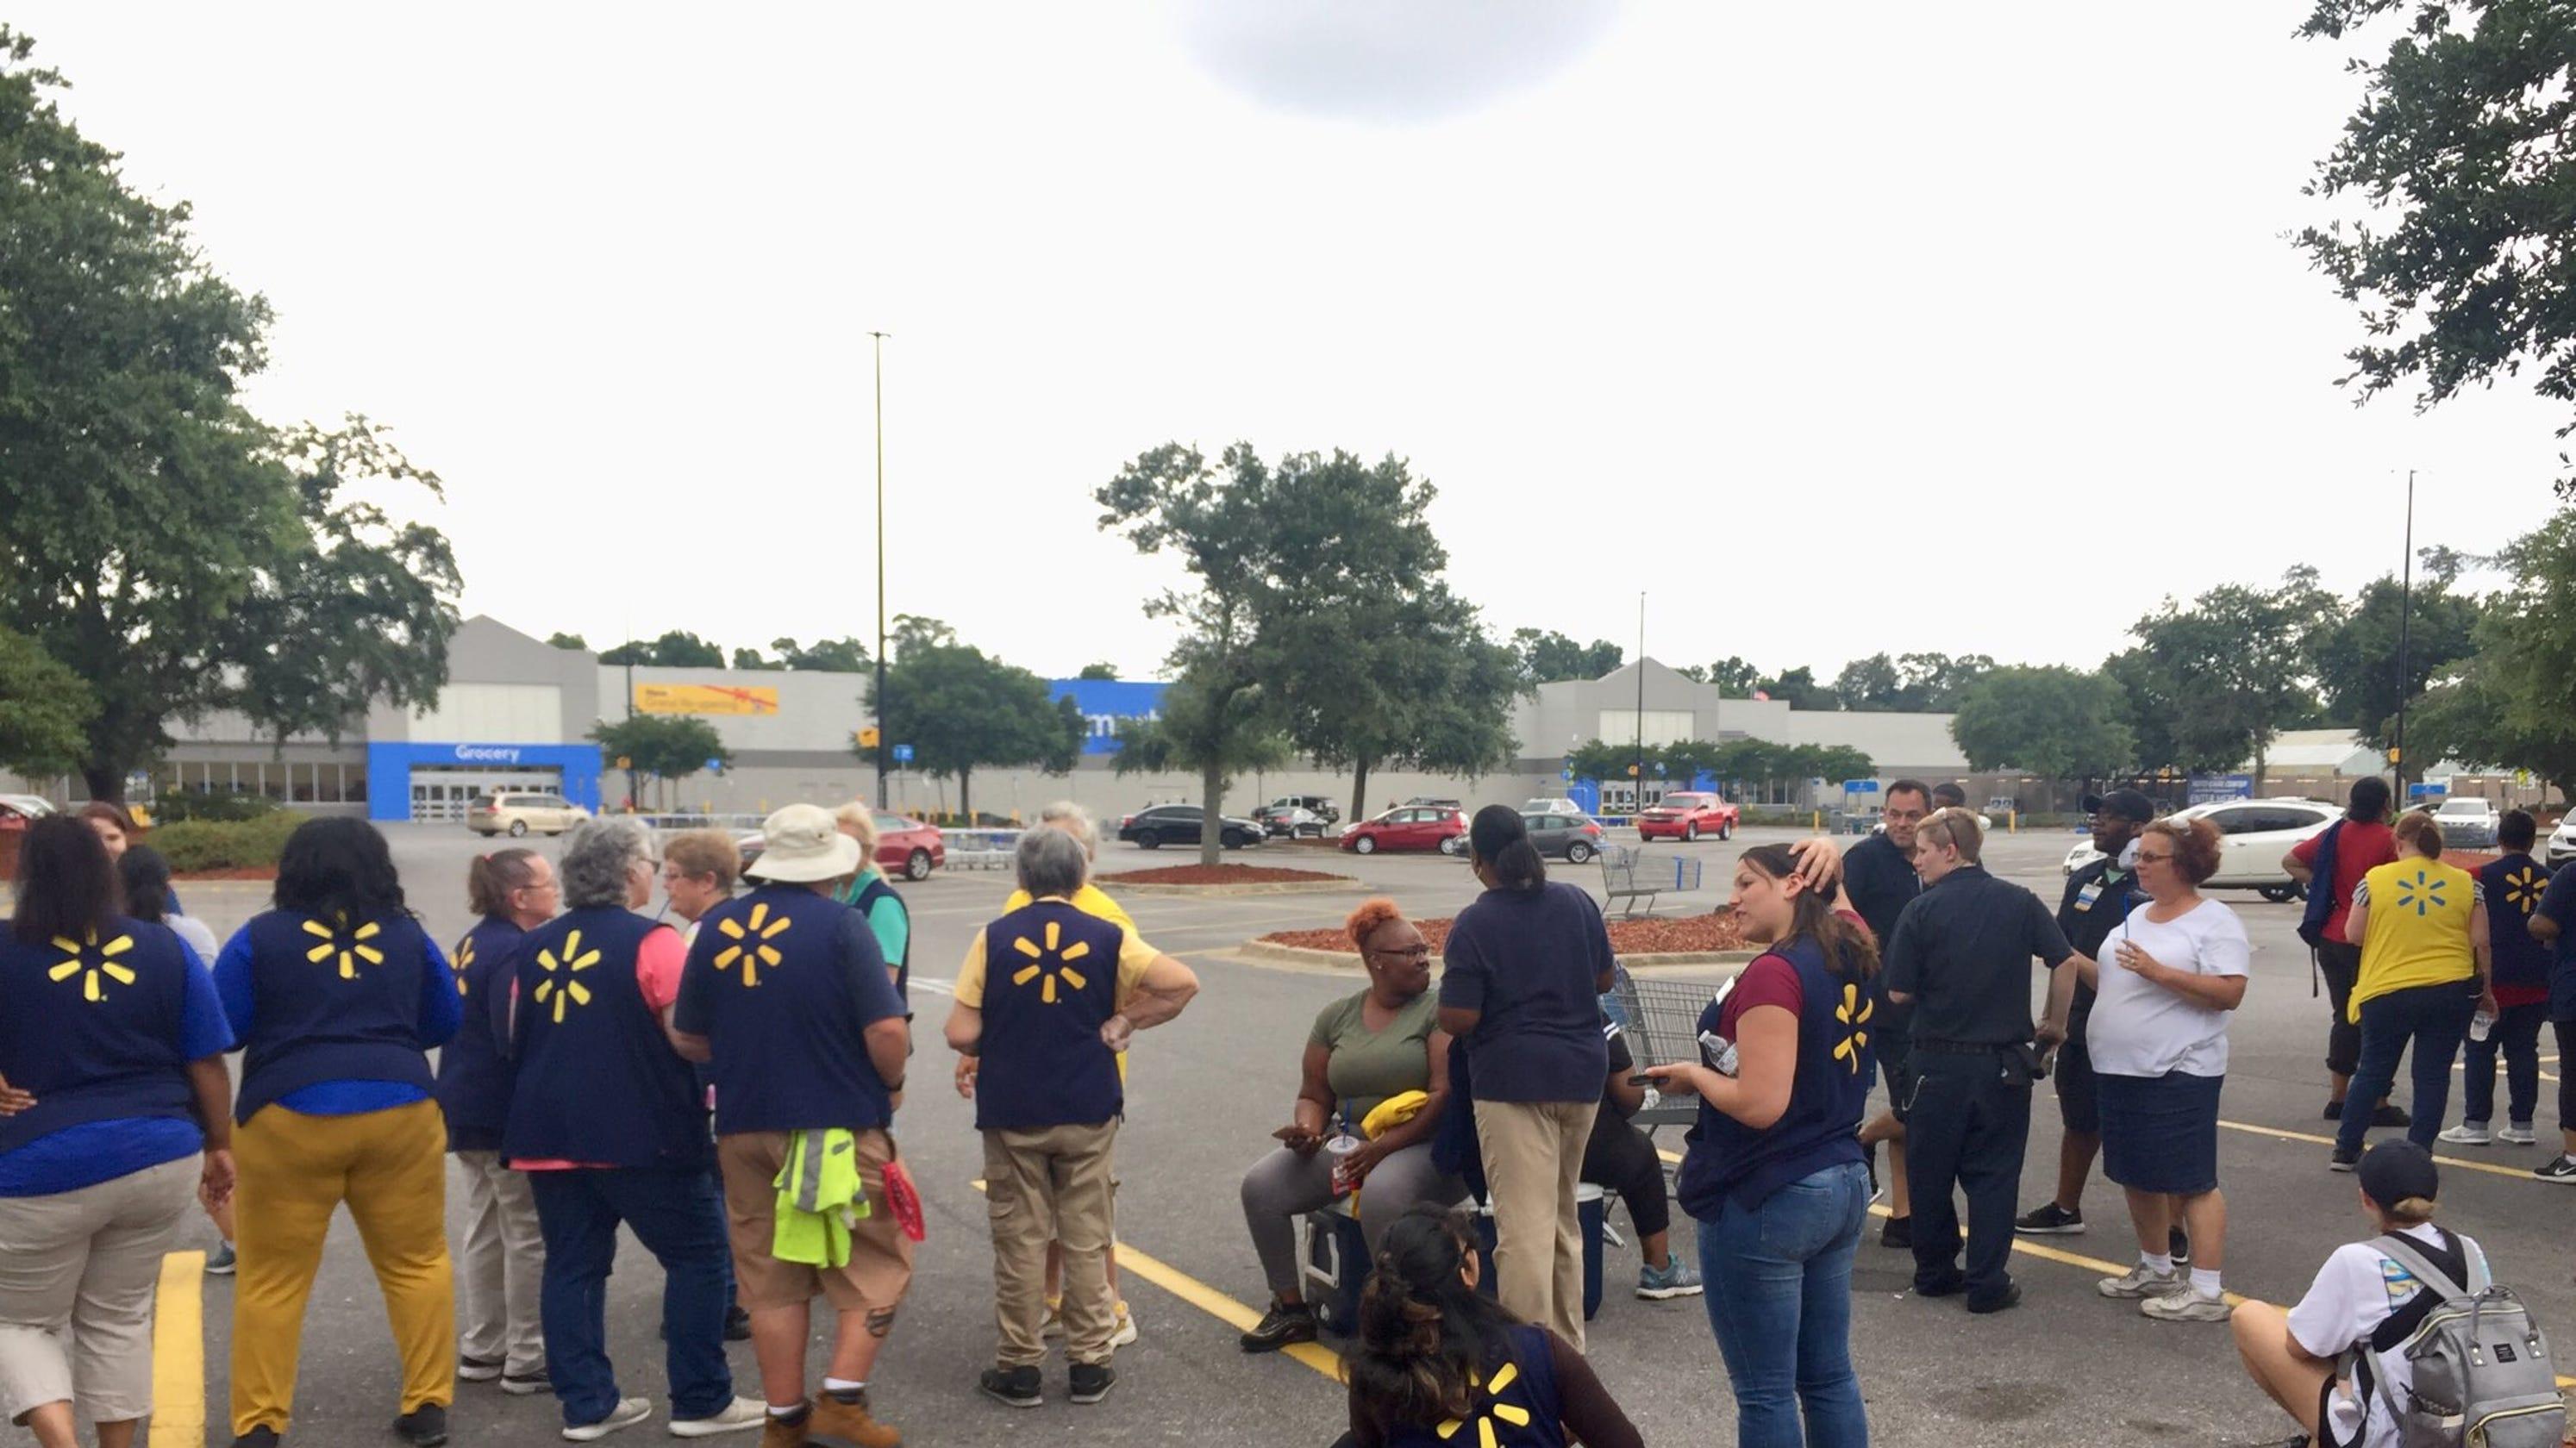 Pensacola Walmart on Creighton Road evacuated due to bomb threat